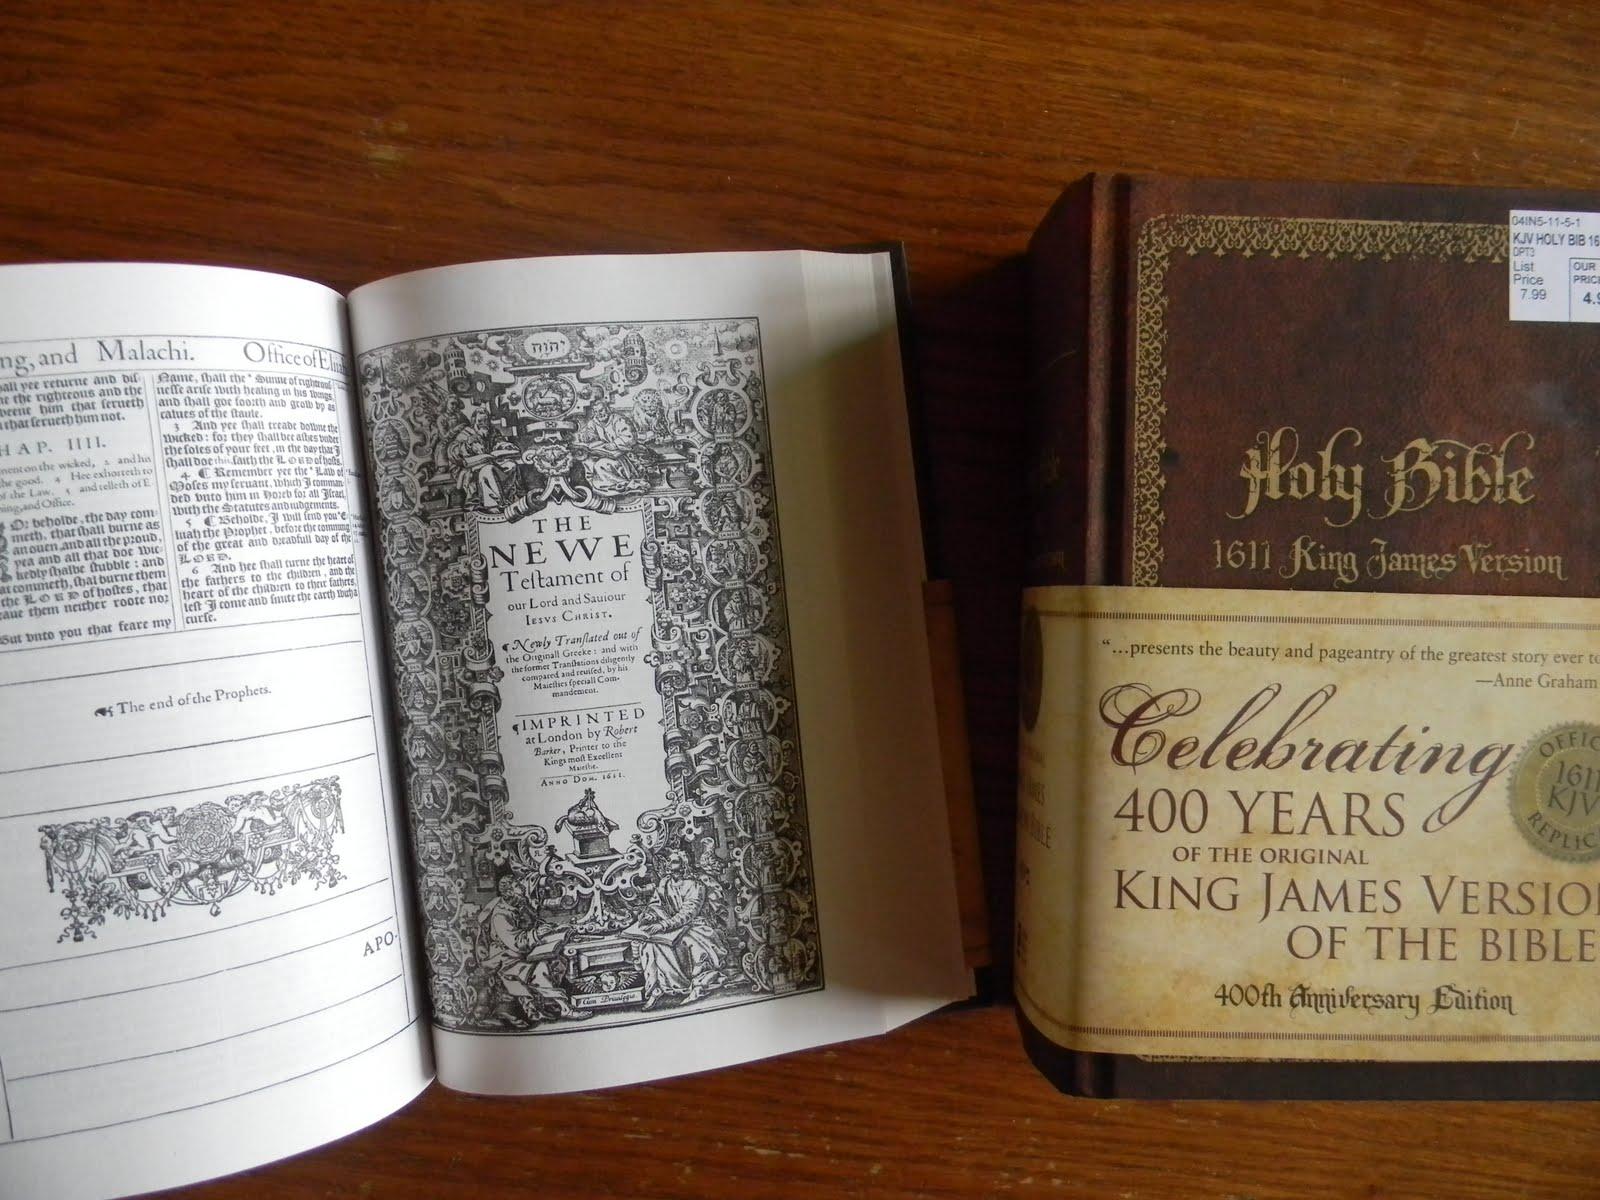 1611 KJV Bible Replica At Wal Mart (!)